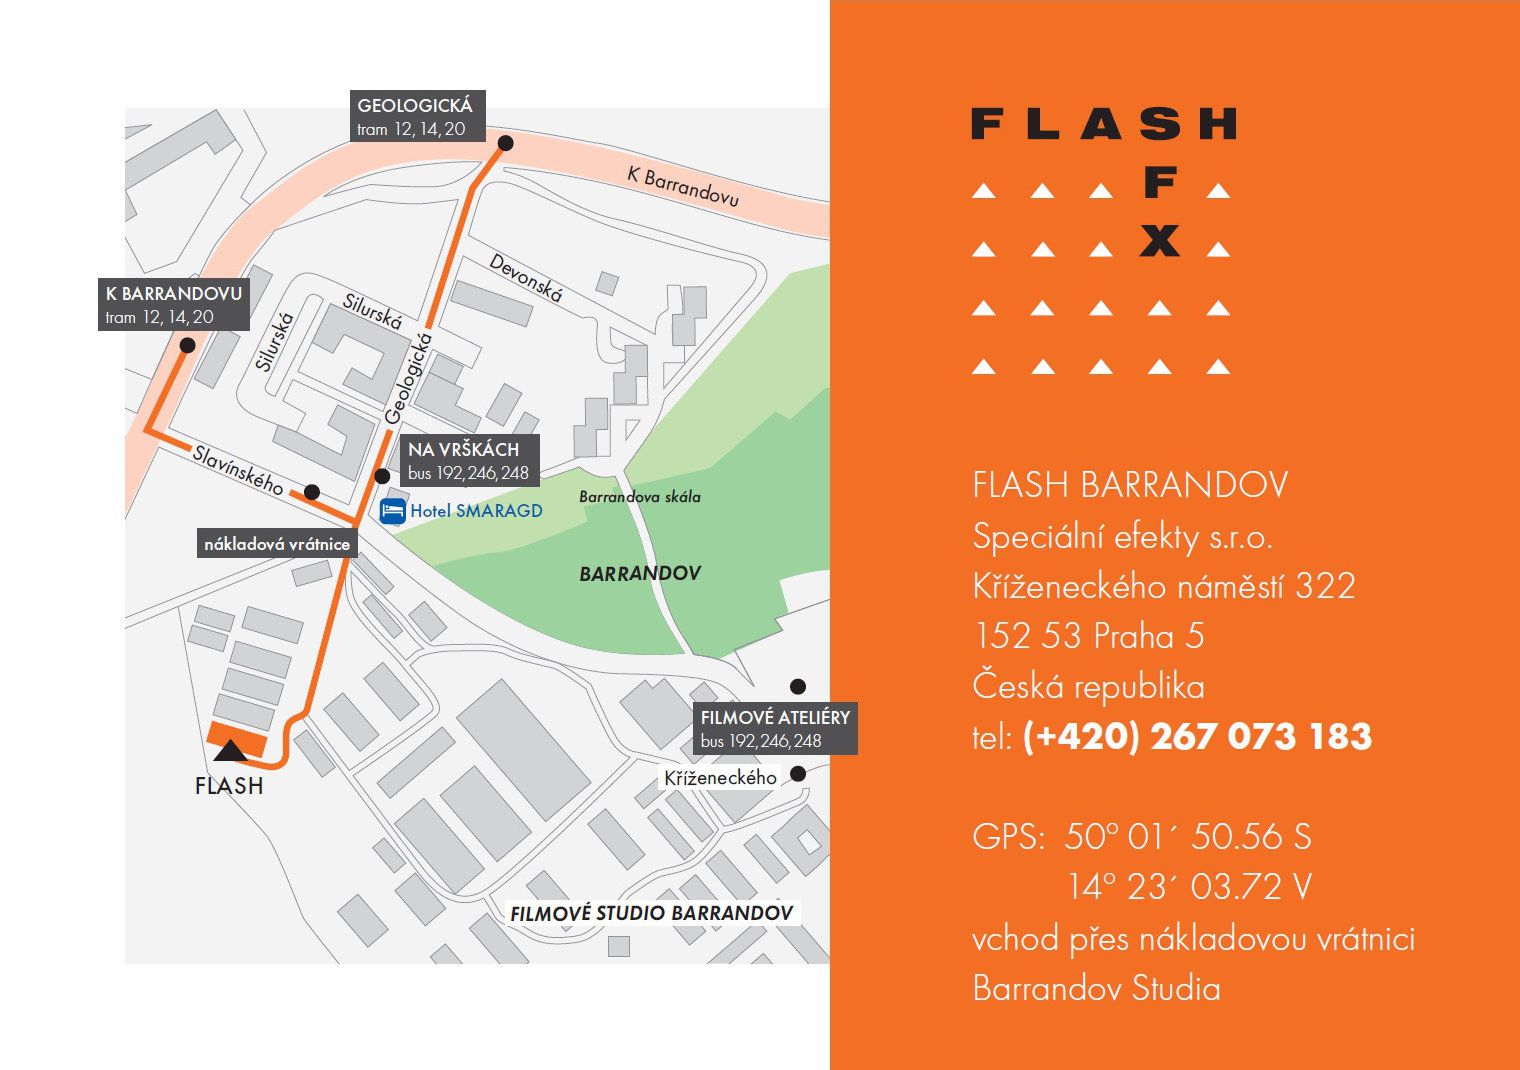 FLASH - mapa 2